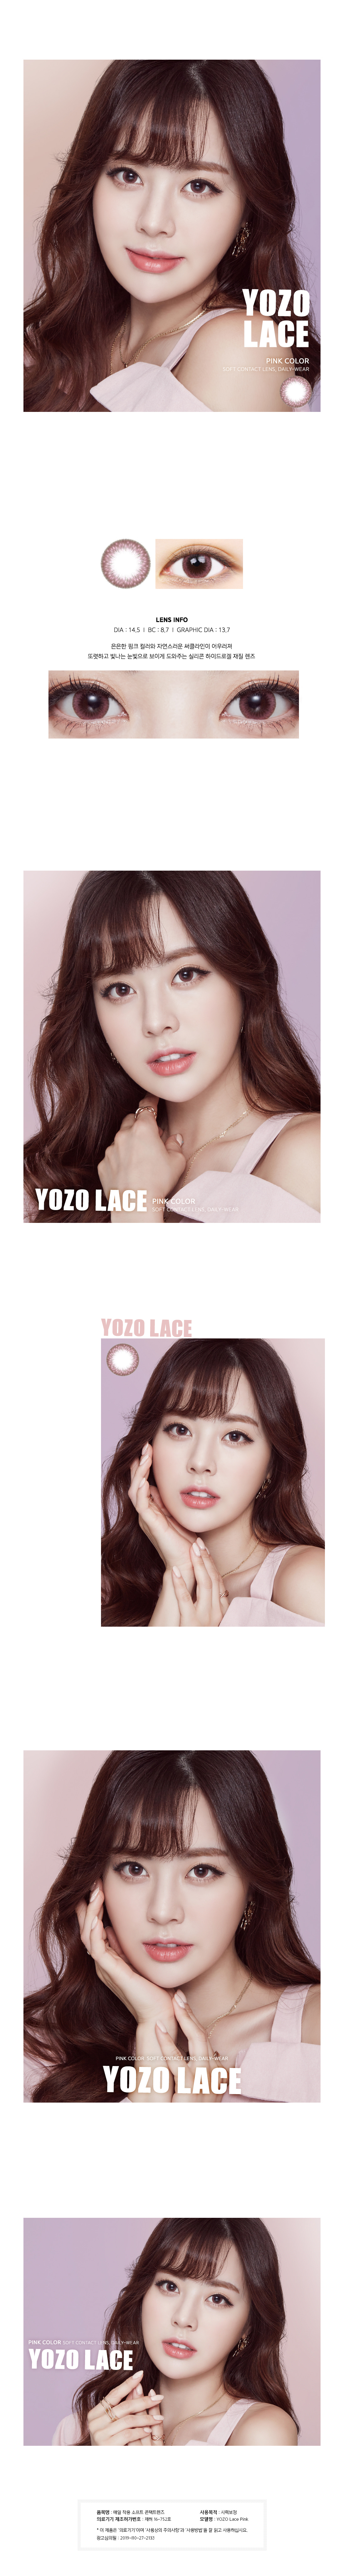 yozolacepink.jpg